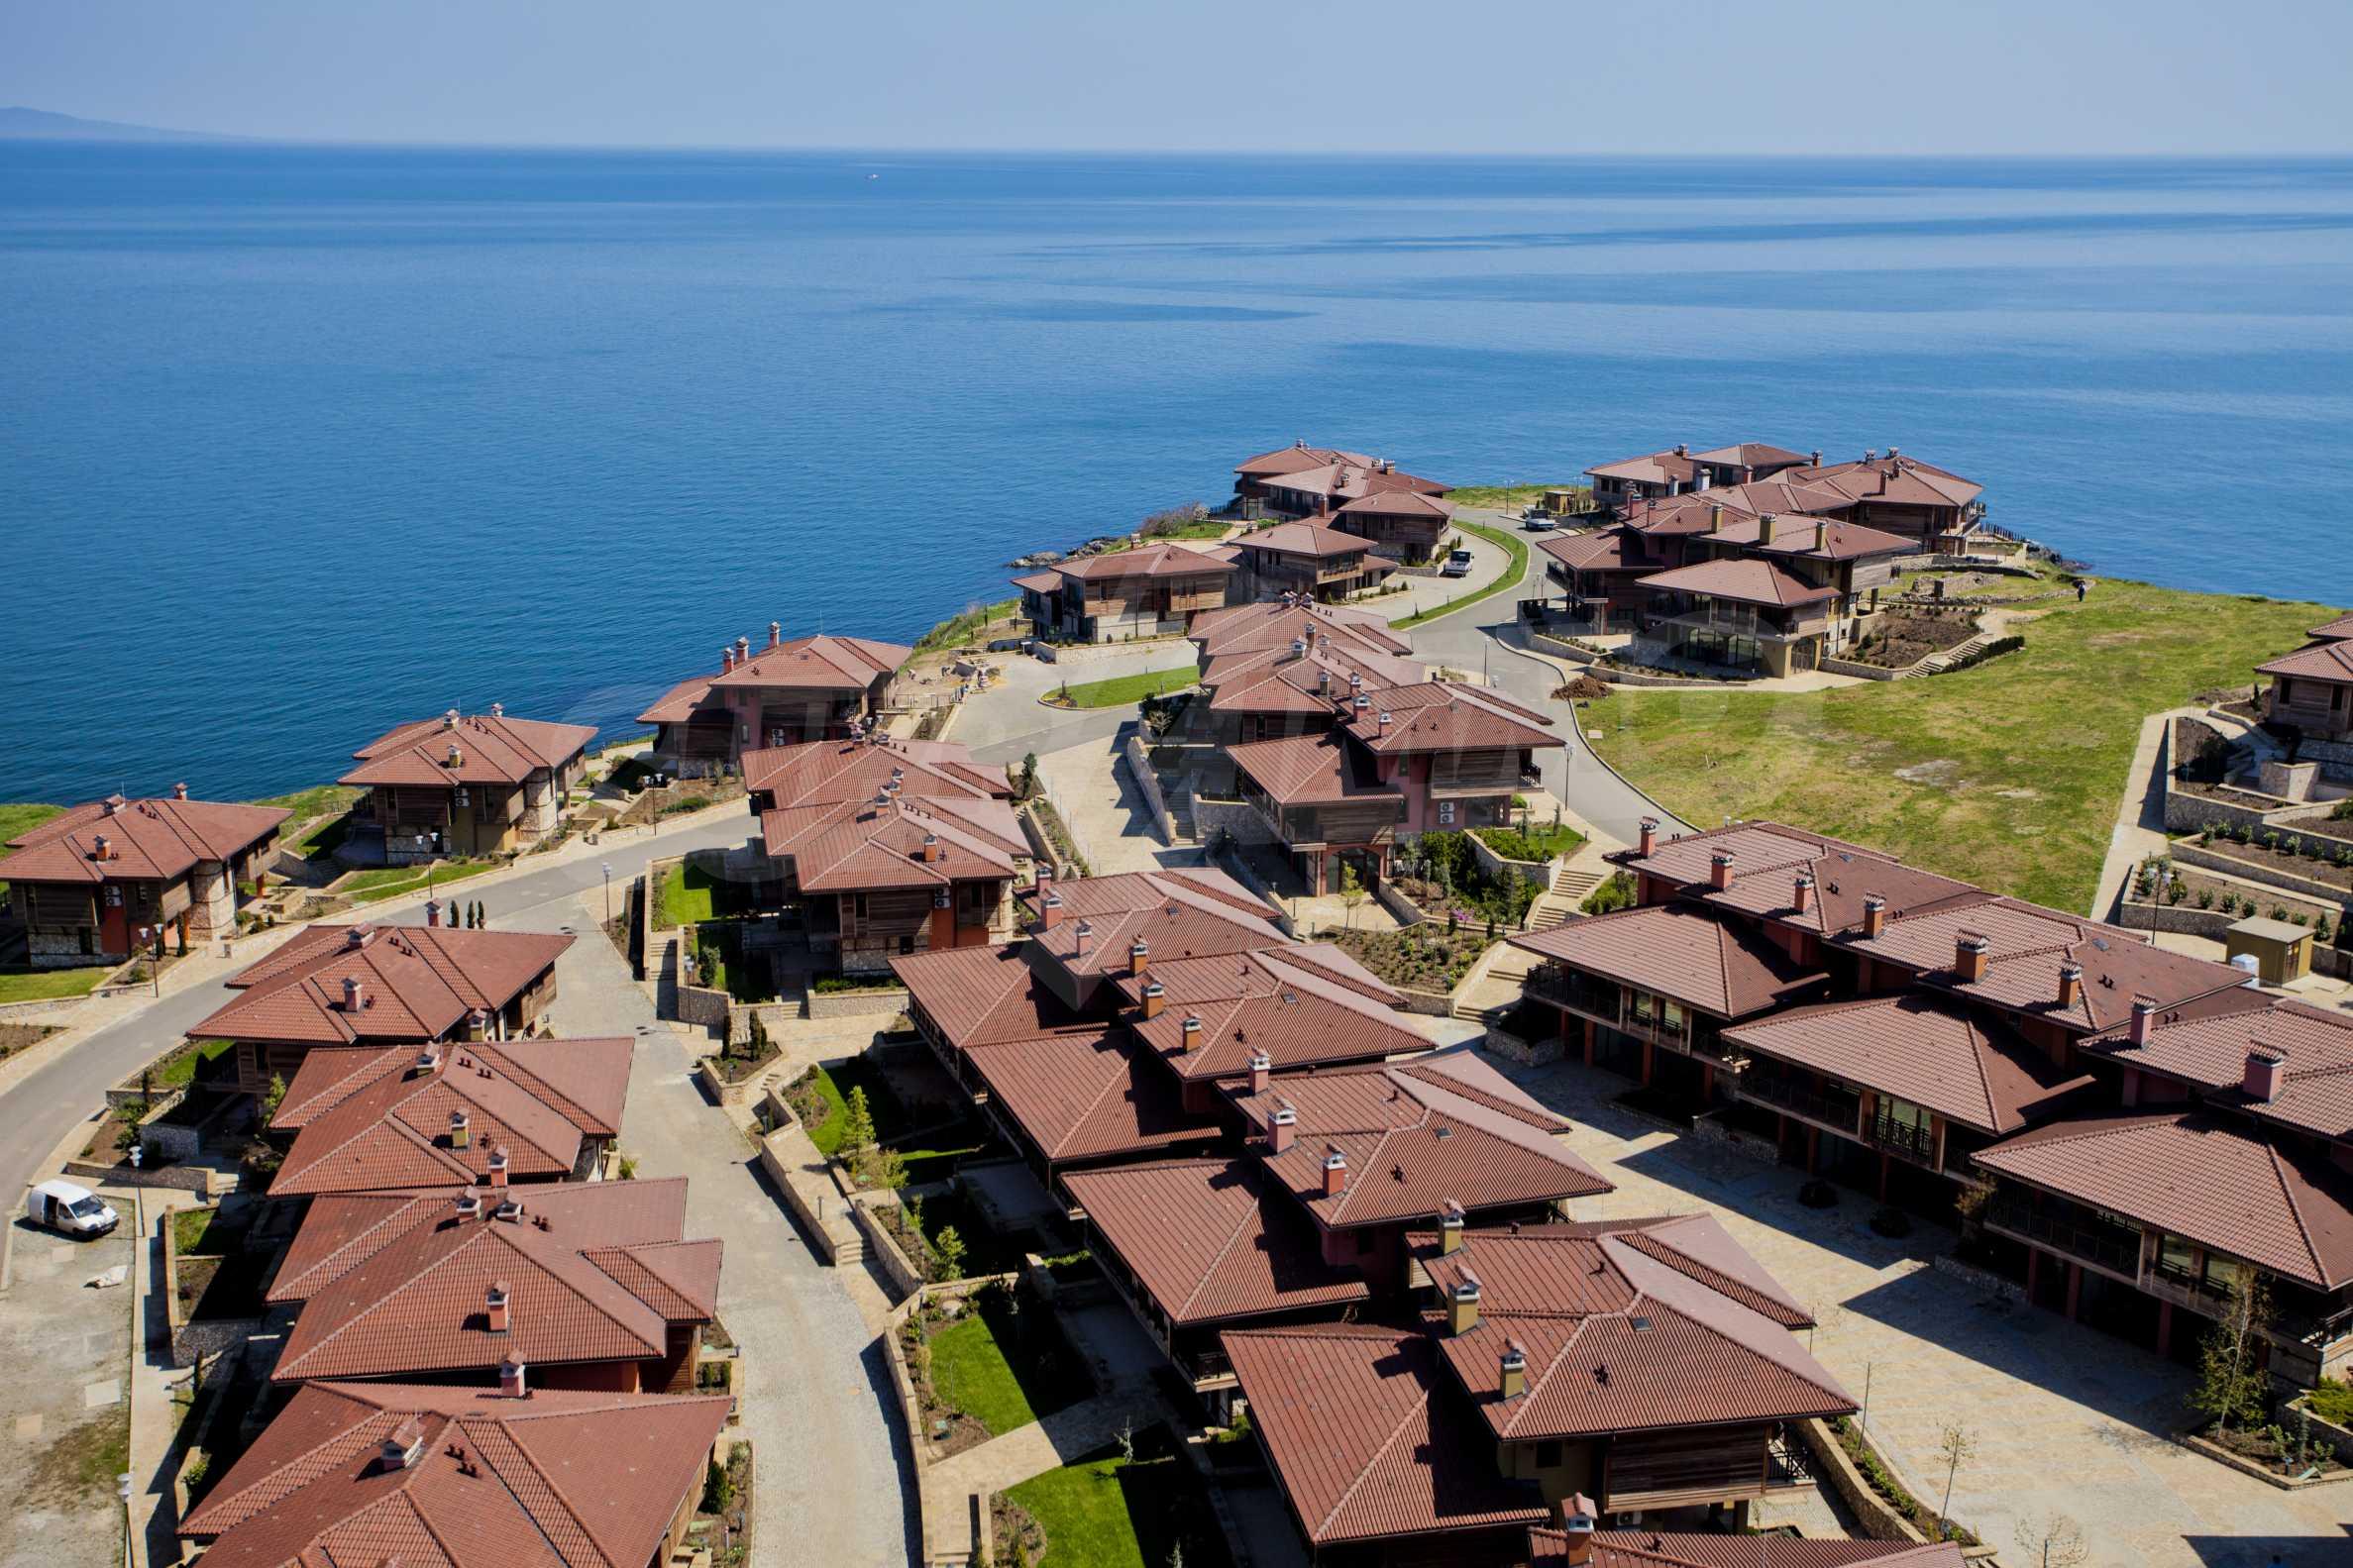 Sozopolis - unique coastal complex of duplex houses and apartments near Sozopol 1